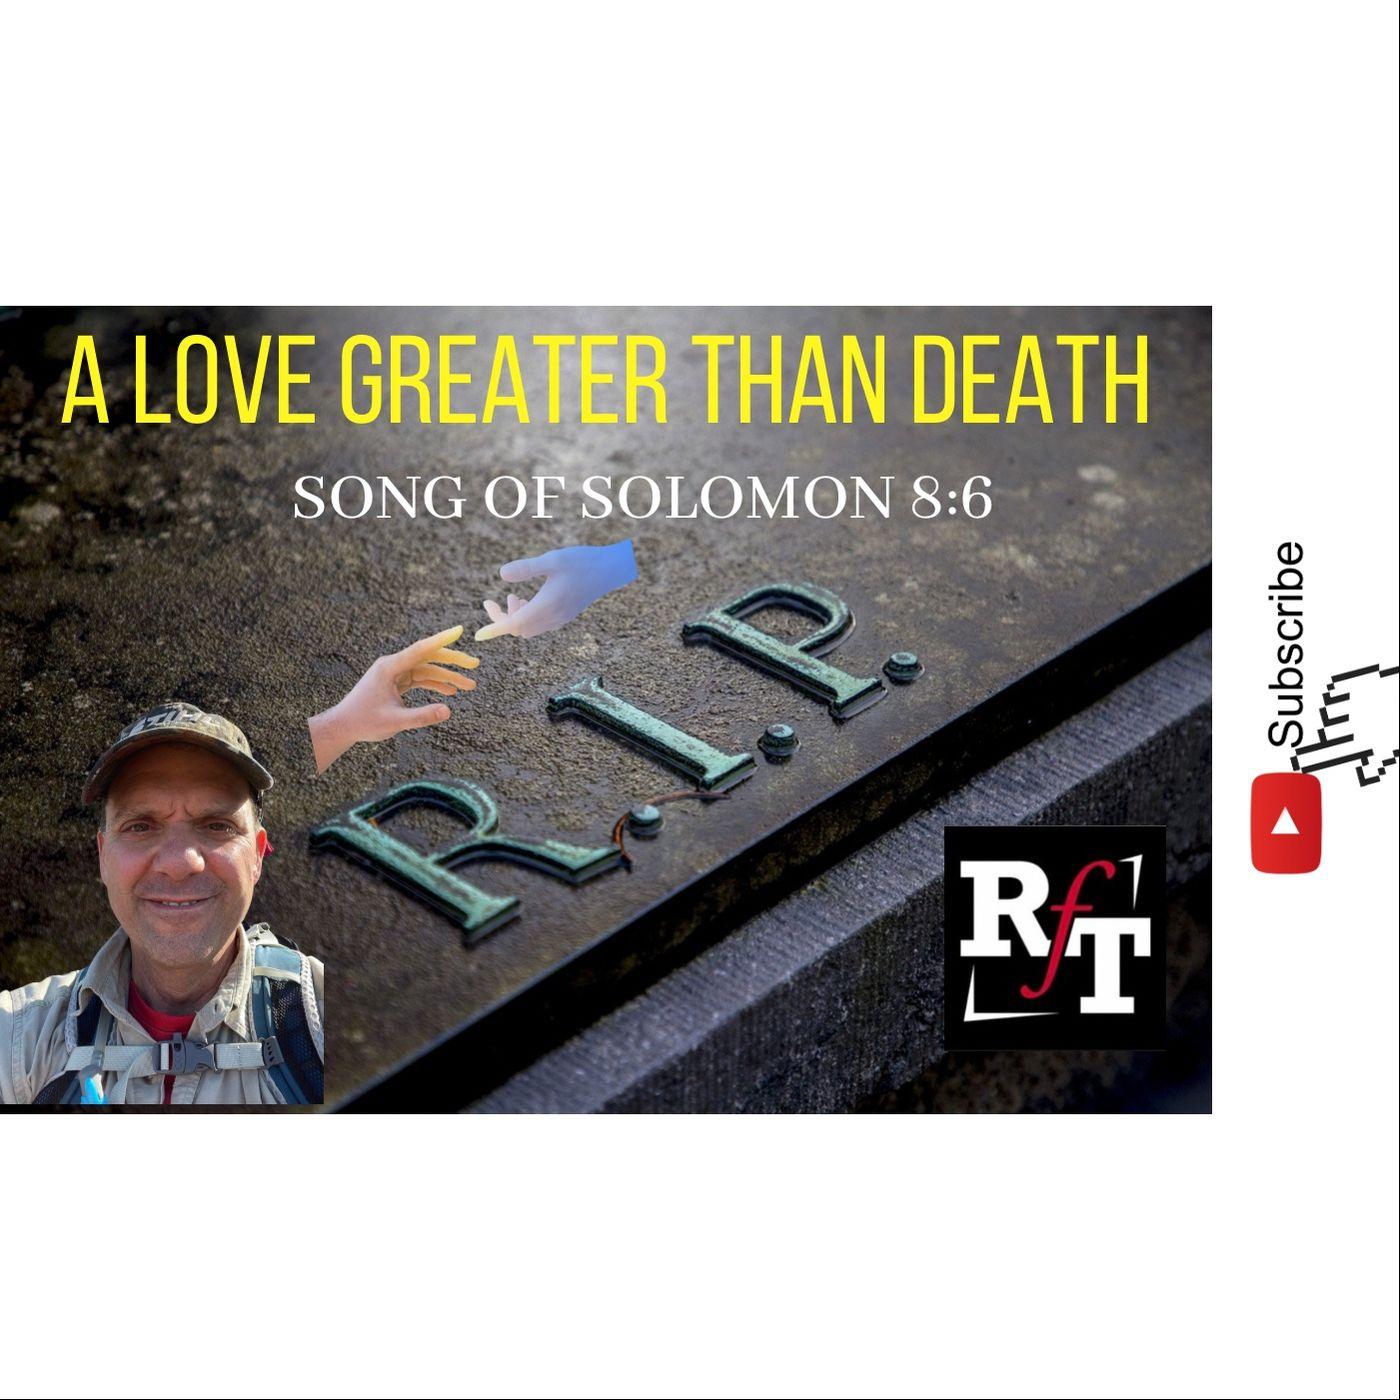 A Love Stronger Than Death - 3:31:21, 4.59 PM